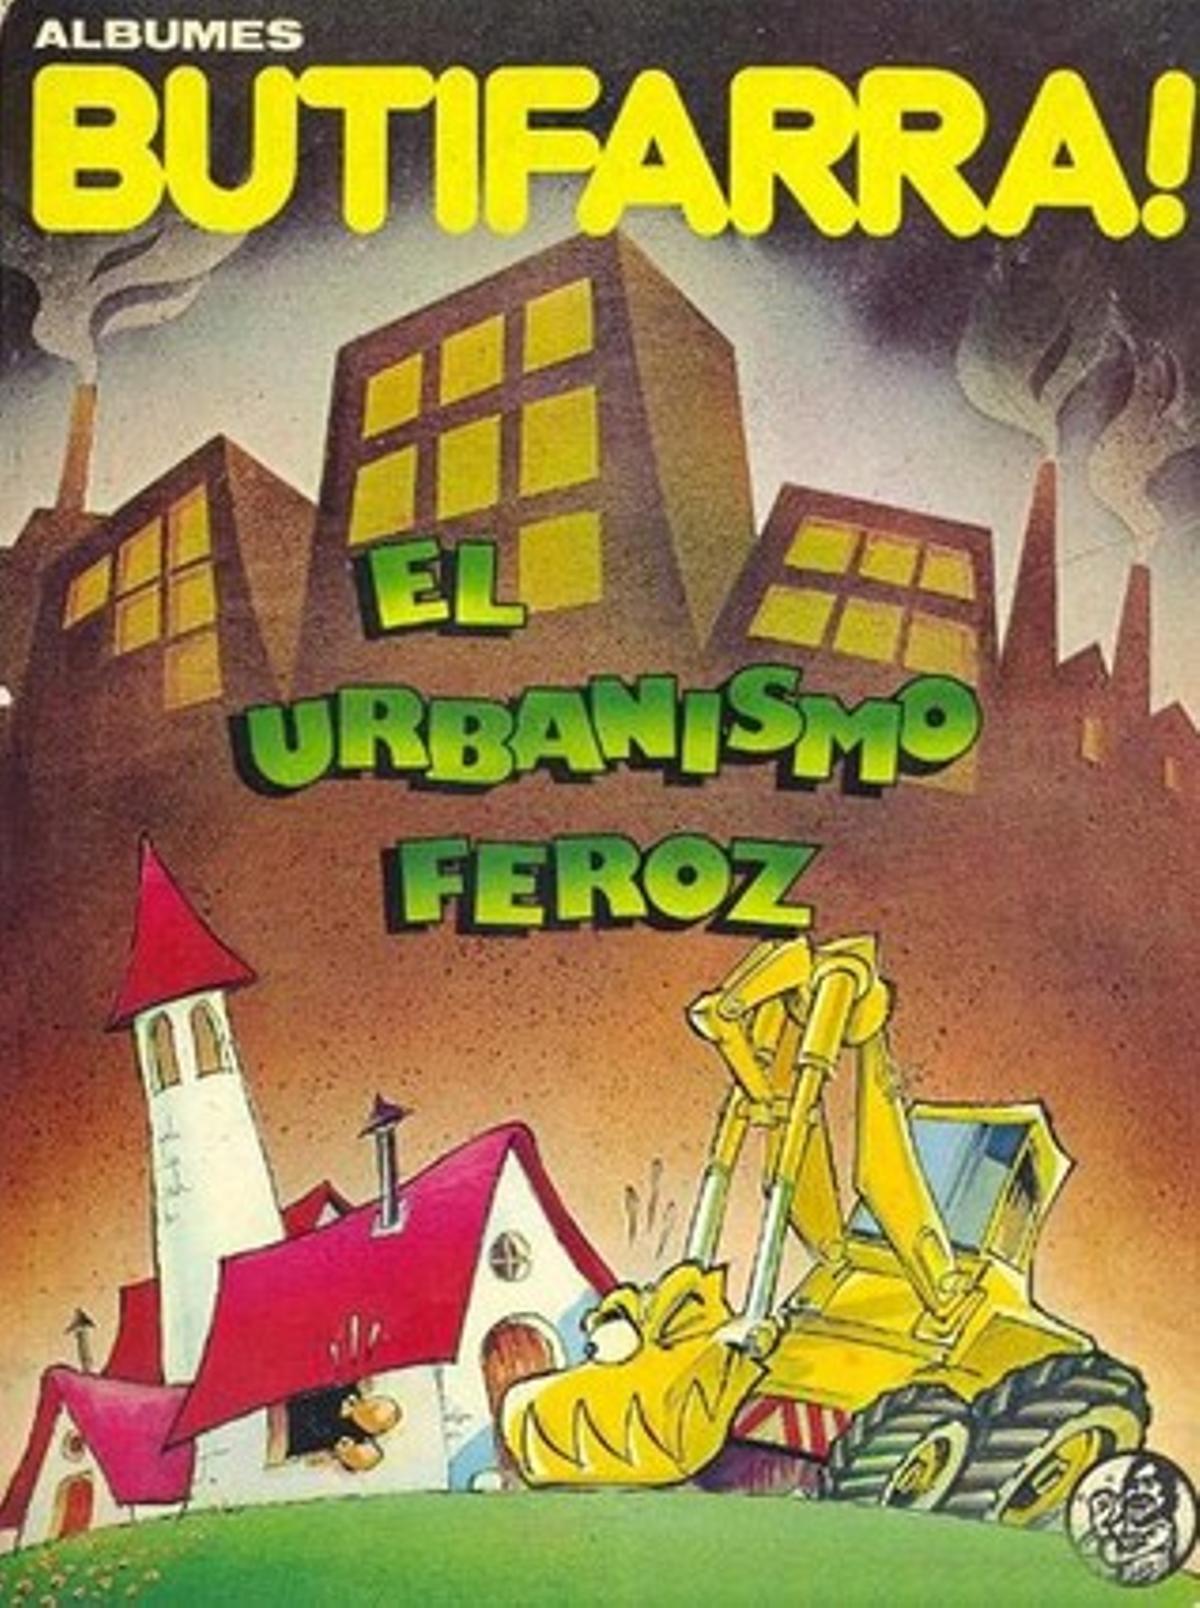 Portada de Rafel Vaquer, del álbum sobre el urbanismo, de 1979.